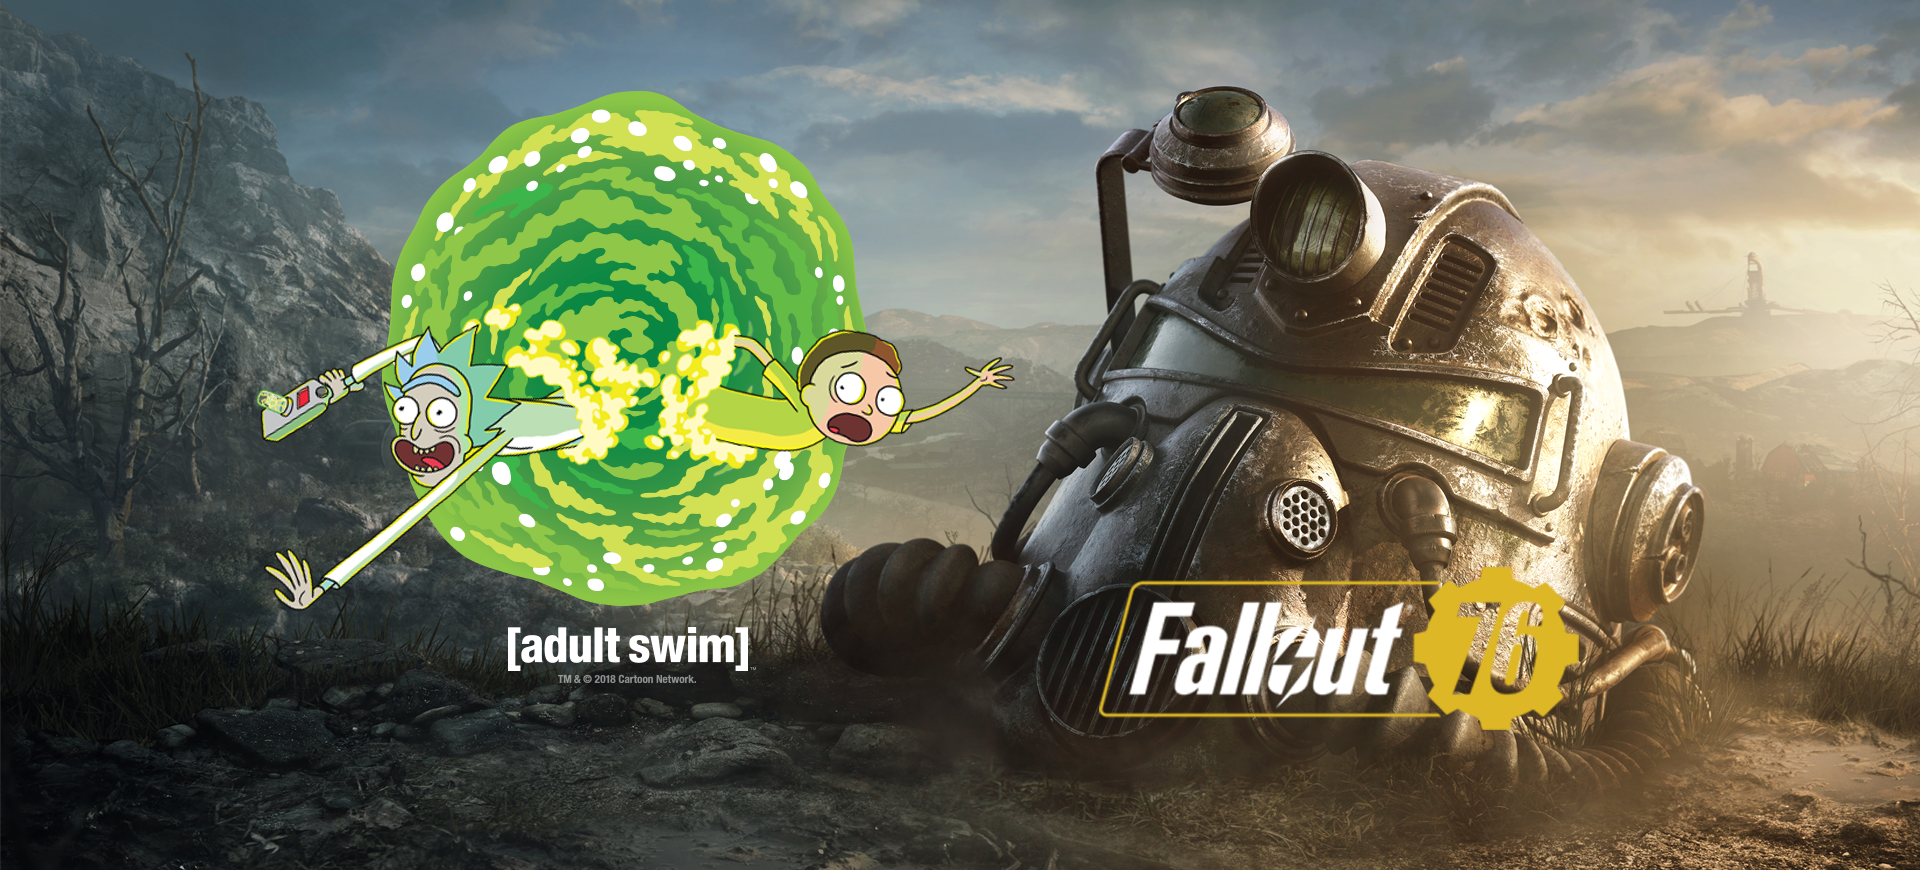 Fallout76_LargeHero_Rick_Morty